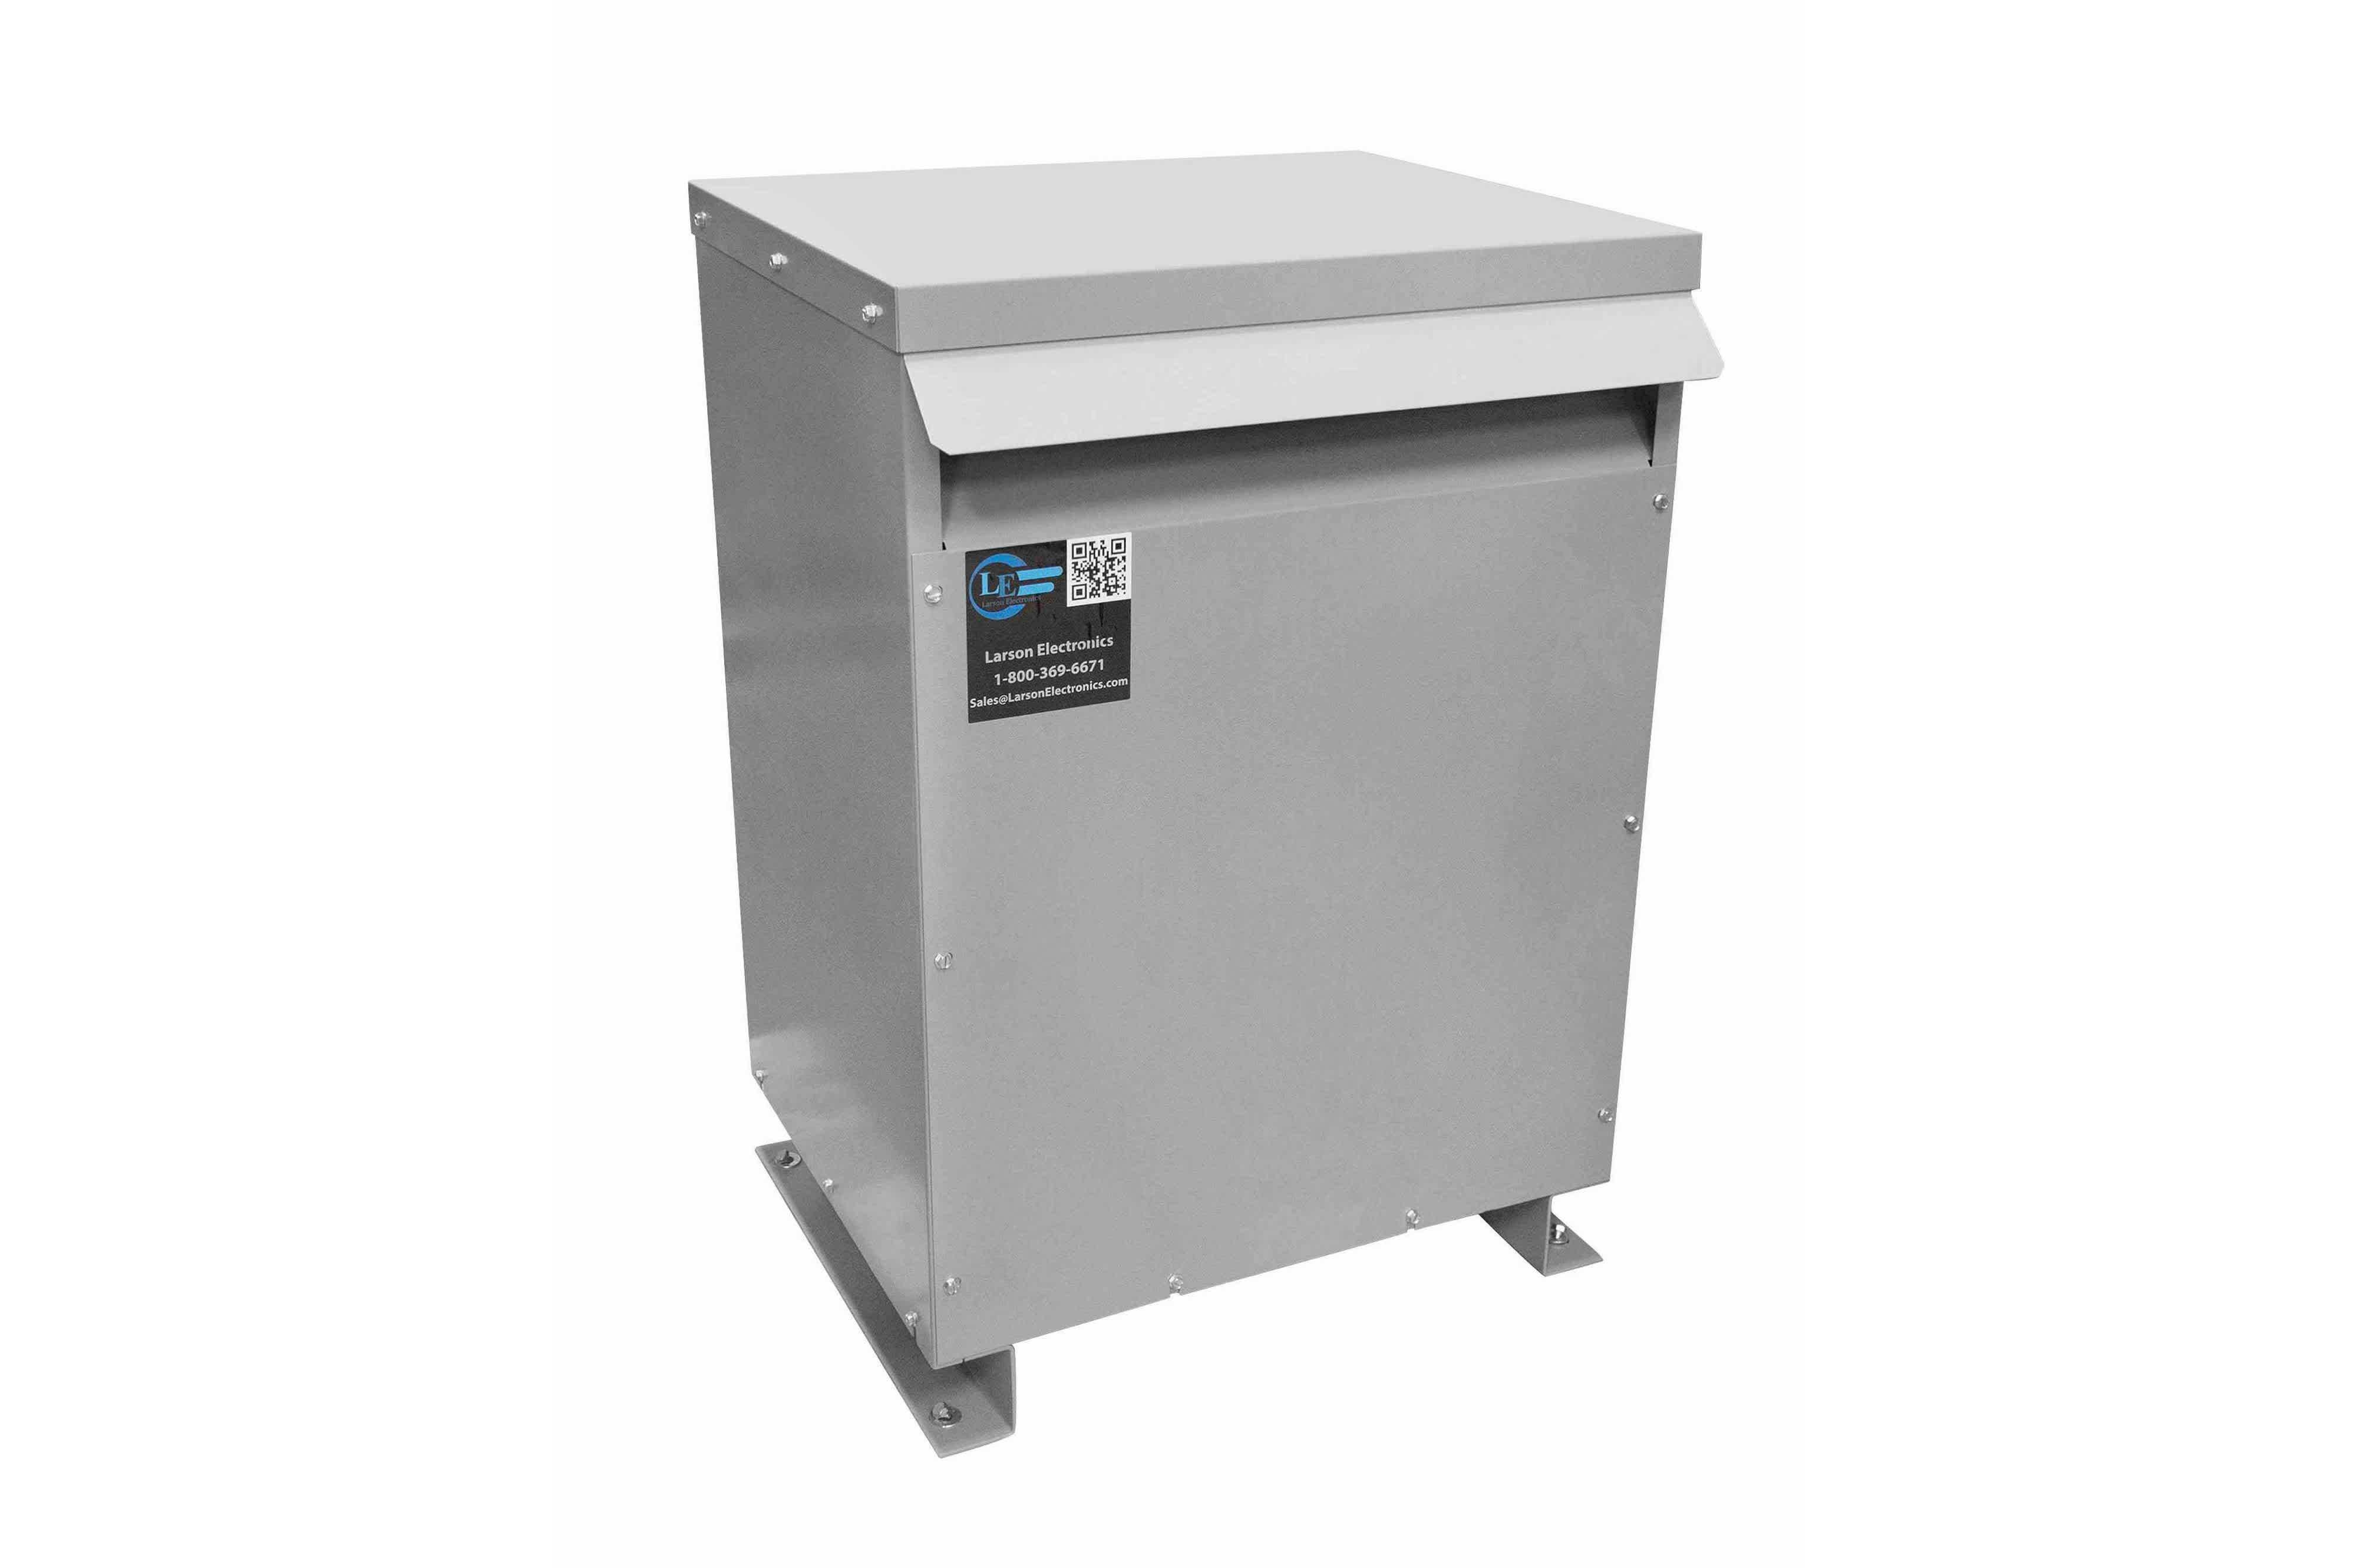 110 kVA 3PH Isolation Transformer, 460V Wye Primary, 415V Delta Secondary, N3R, Ventilated, 60 Hz